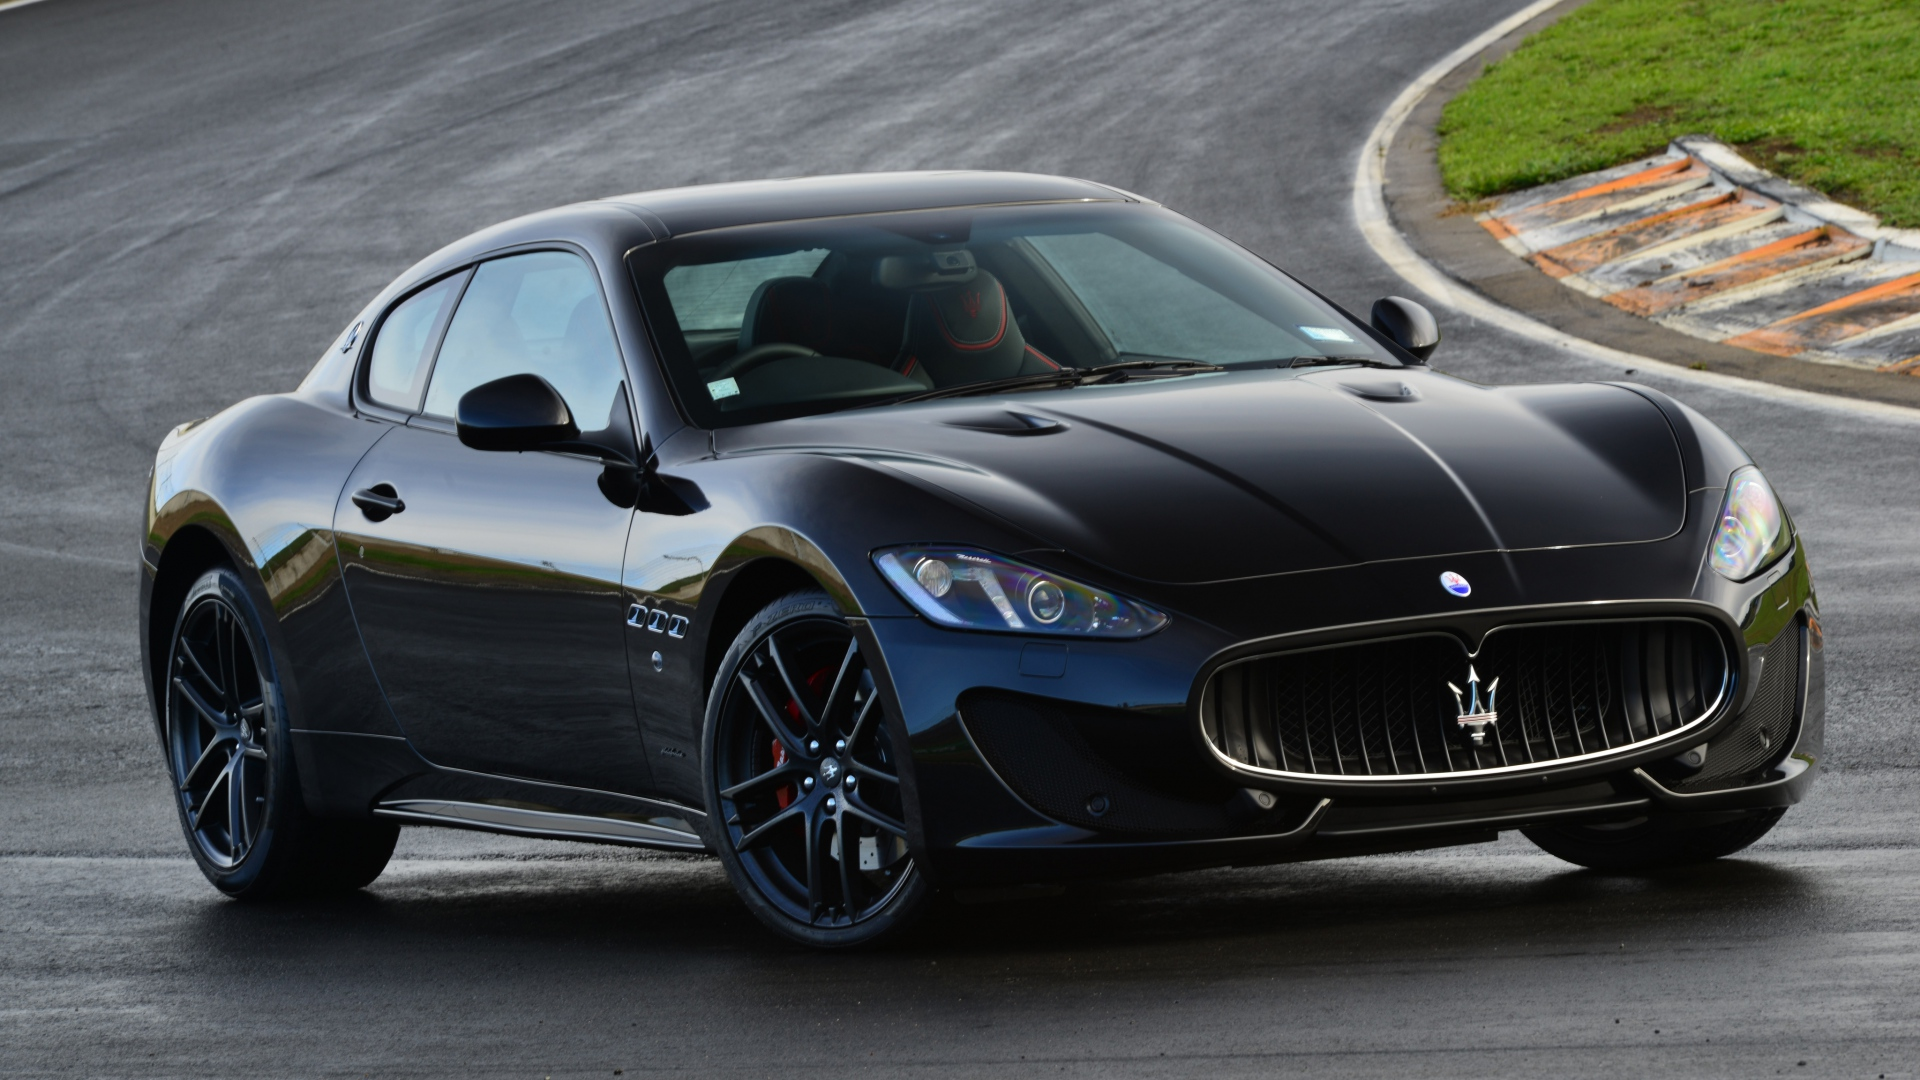 Maserati Gran Turismo HD Cars 4k Wallpapers Images